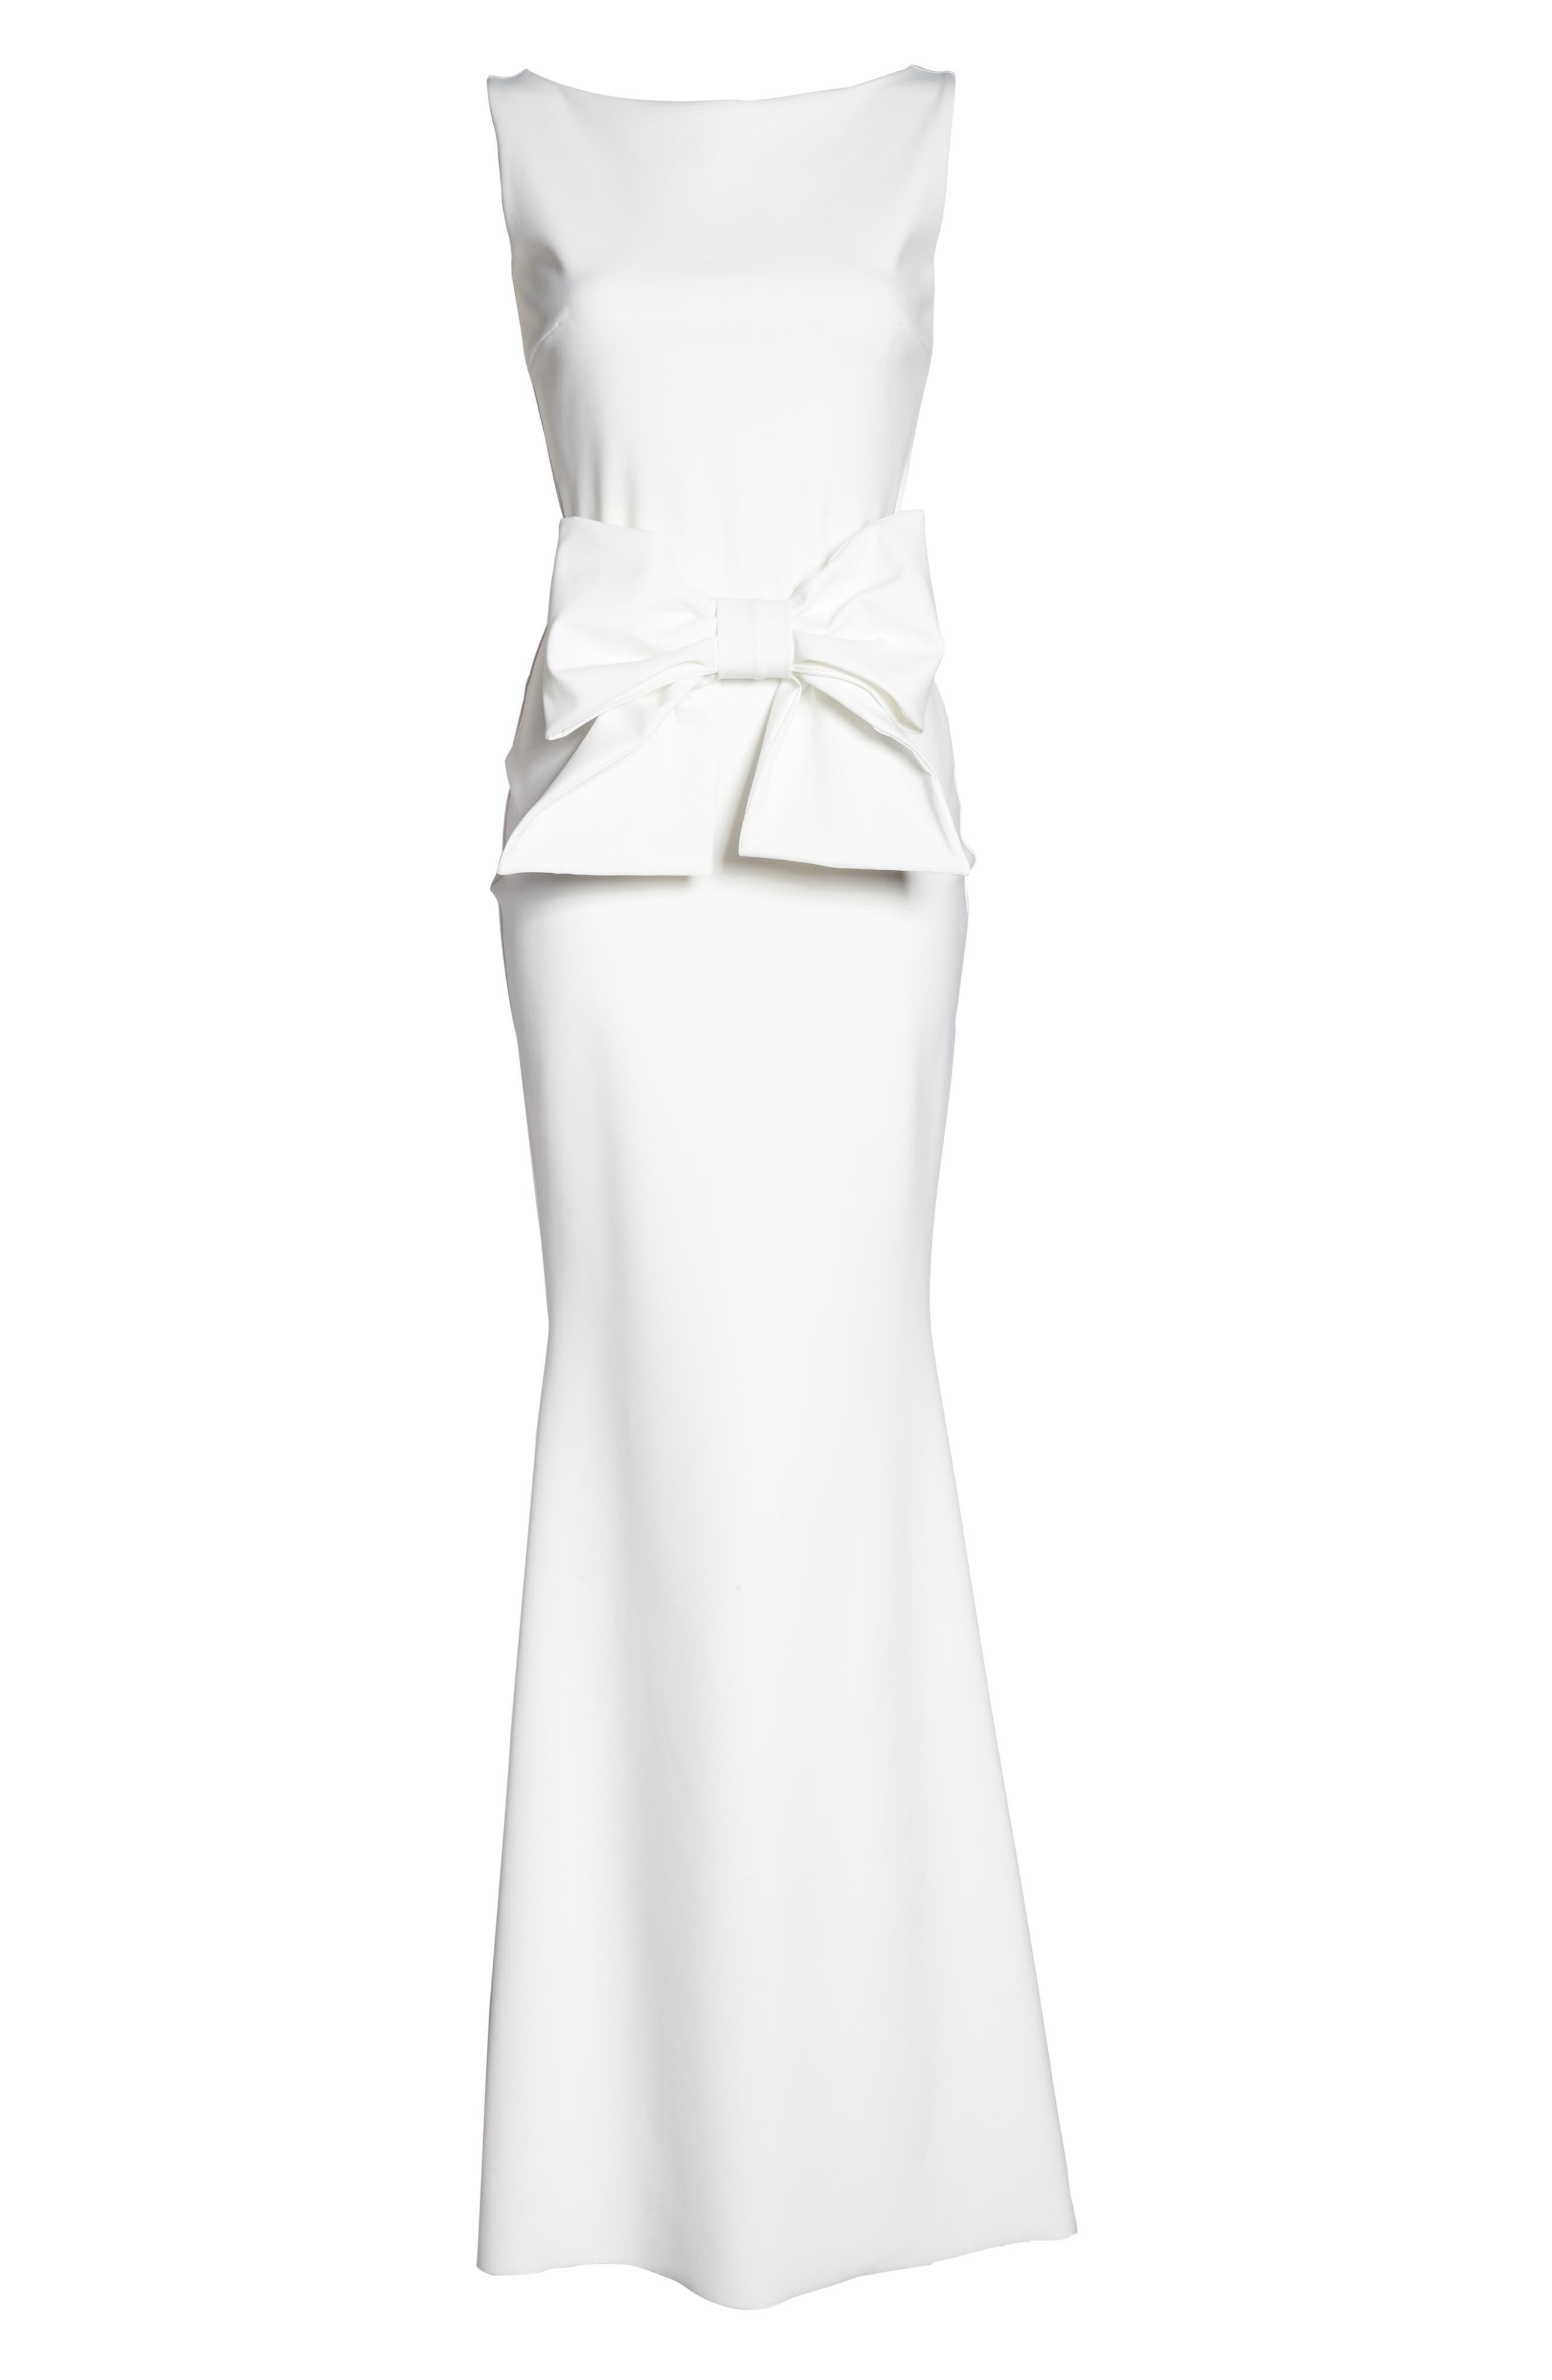 CHIARA BONI LA PETITE ROBE,                             Bow Detail Sleeveless Gown,                             Alternate thumbnail 6, color,                             100